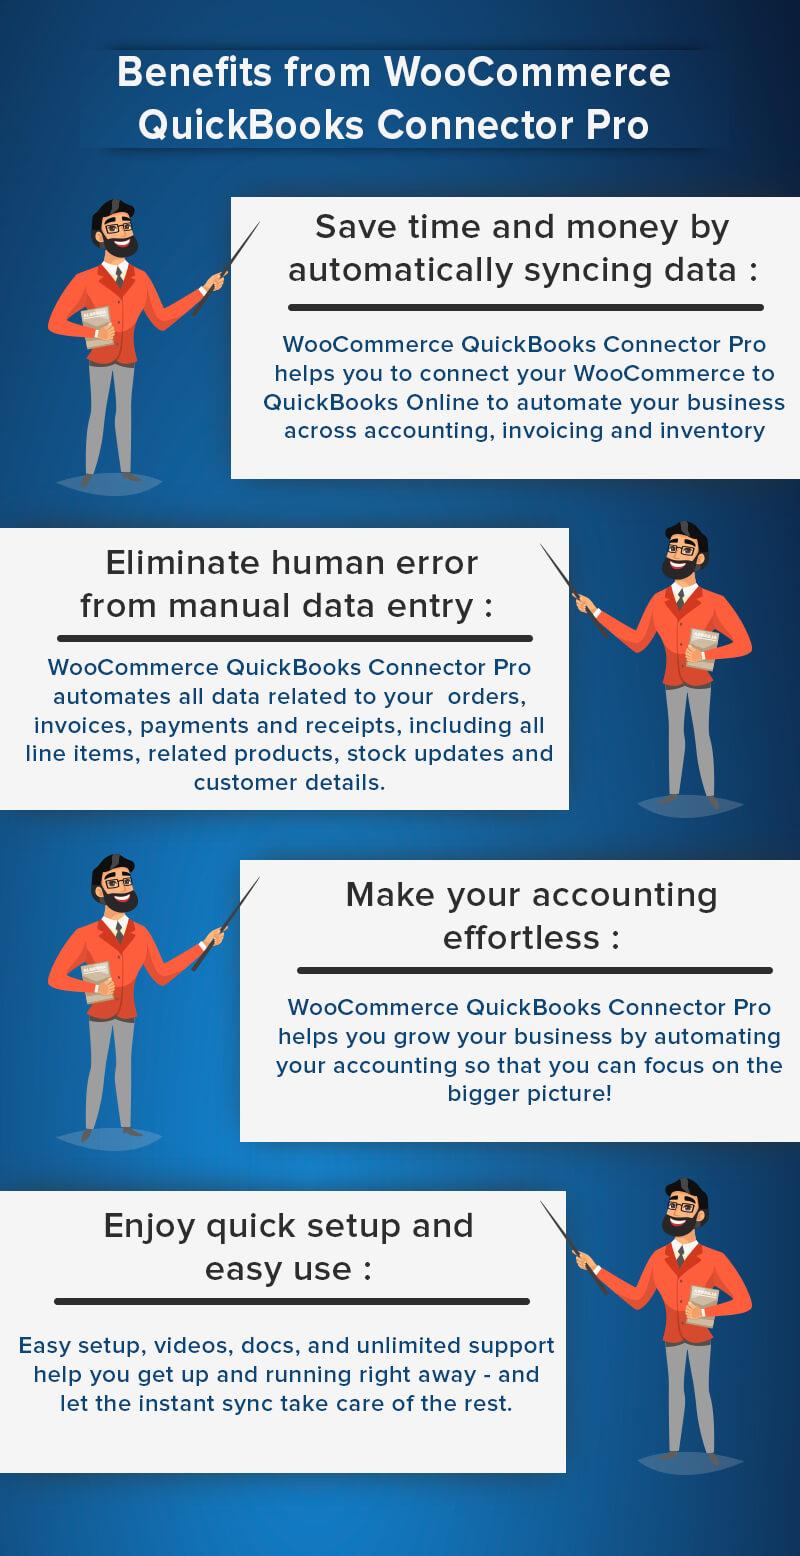 woocommerce-quickbooks-connector-pro-benefits